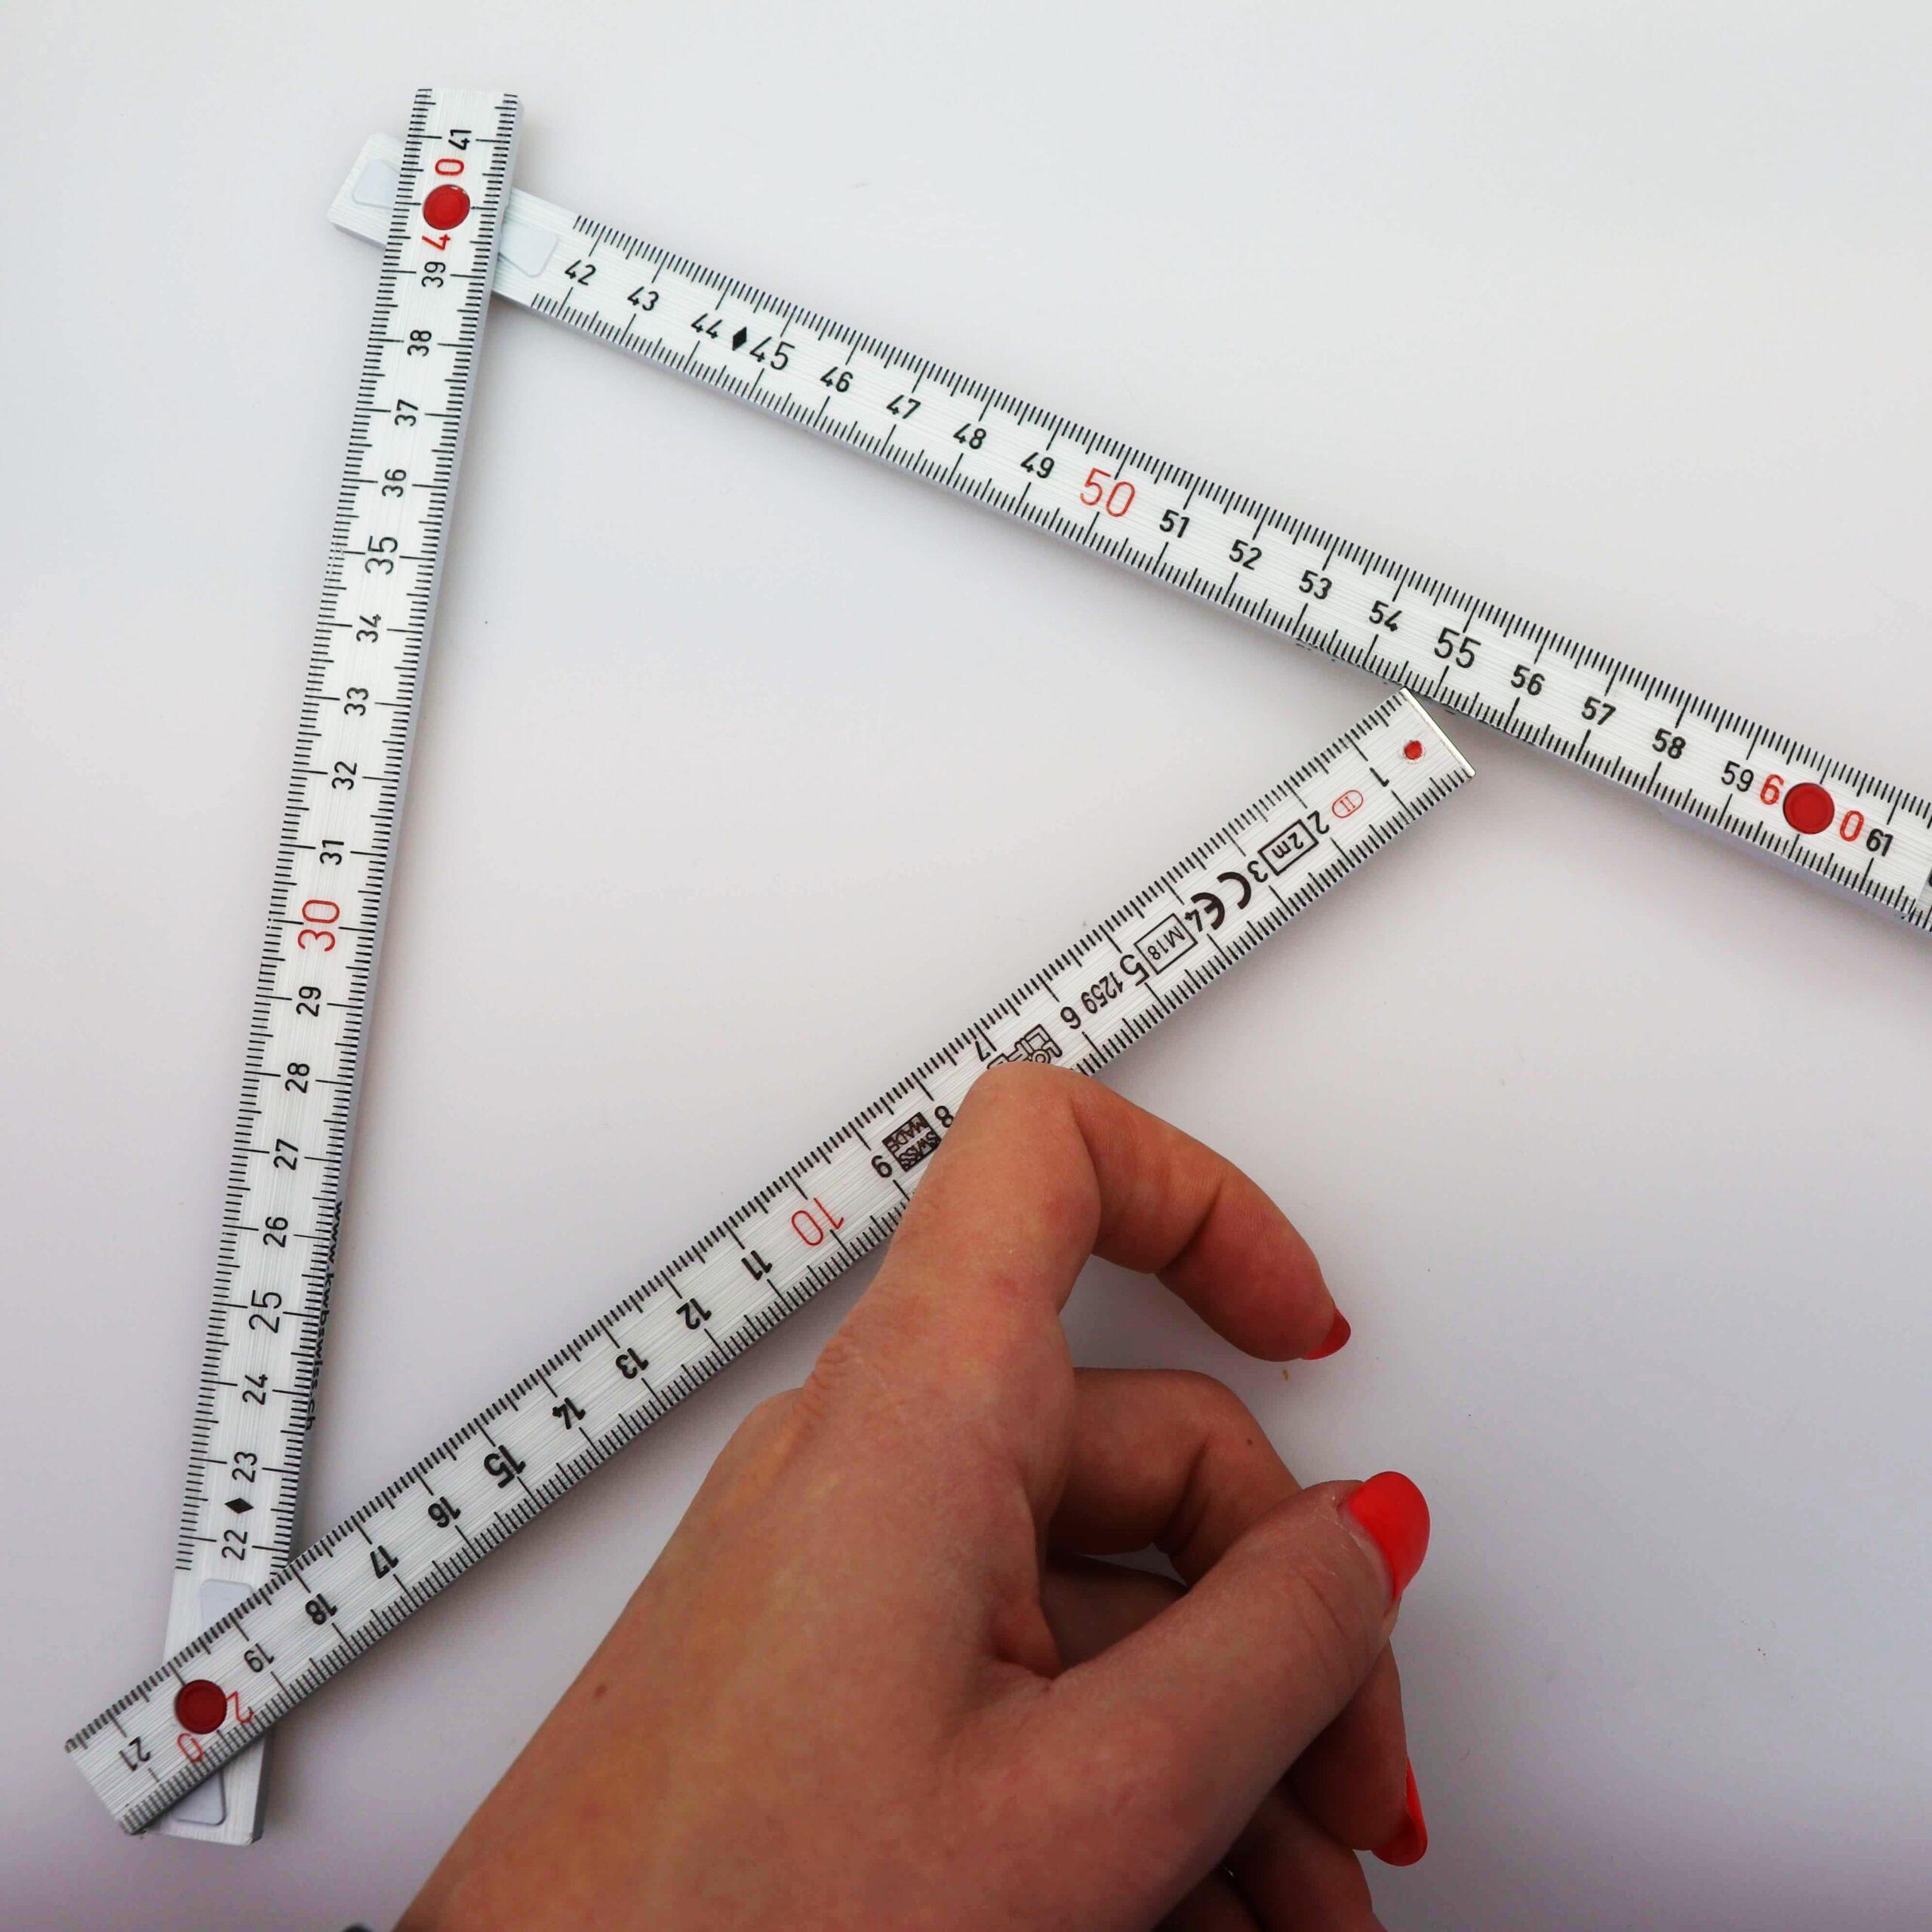 Winkel messen mit Doppelmeter - SchweizerMeter_quadrat-min